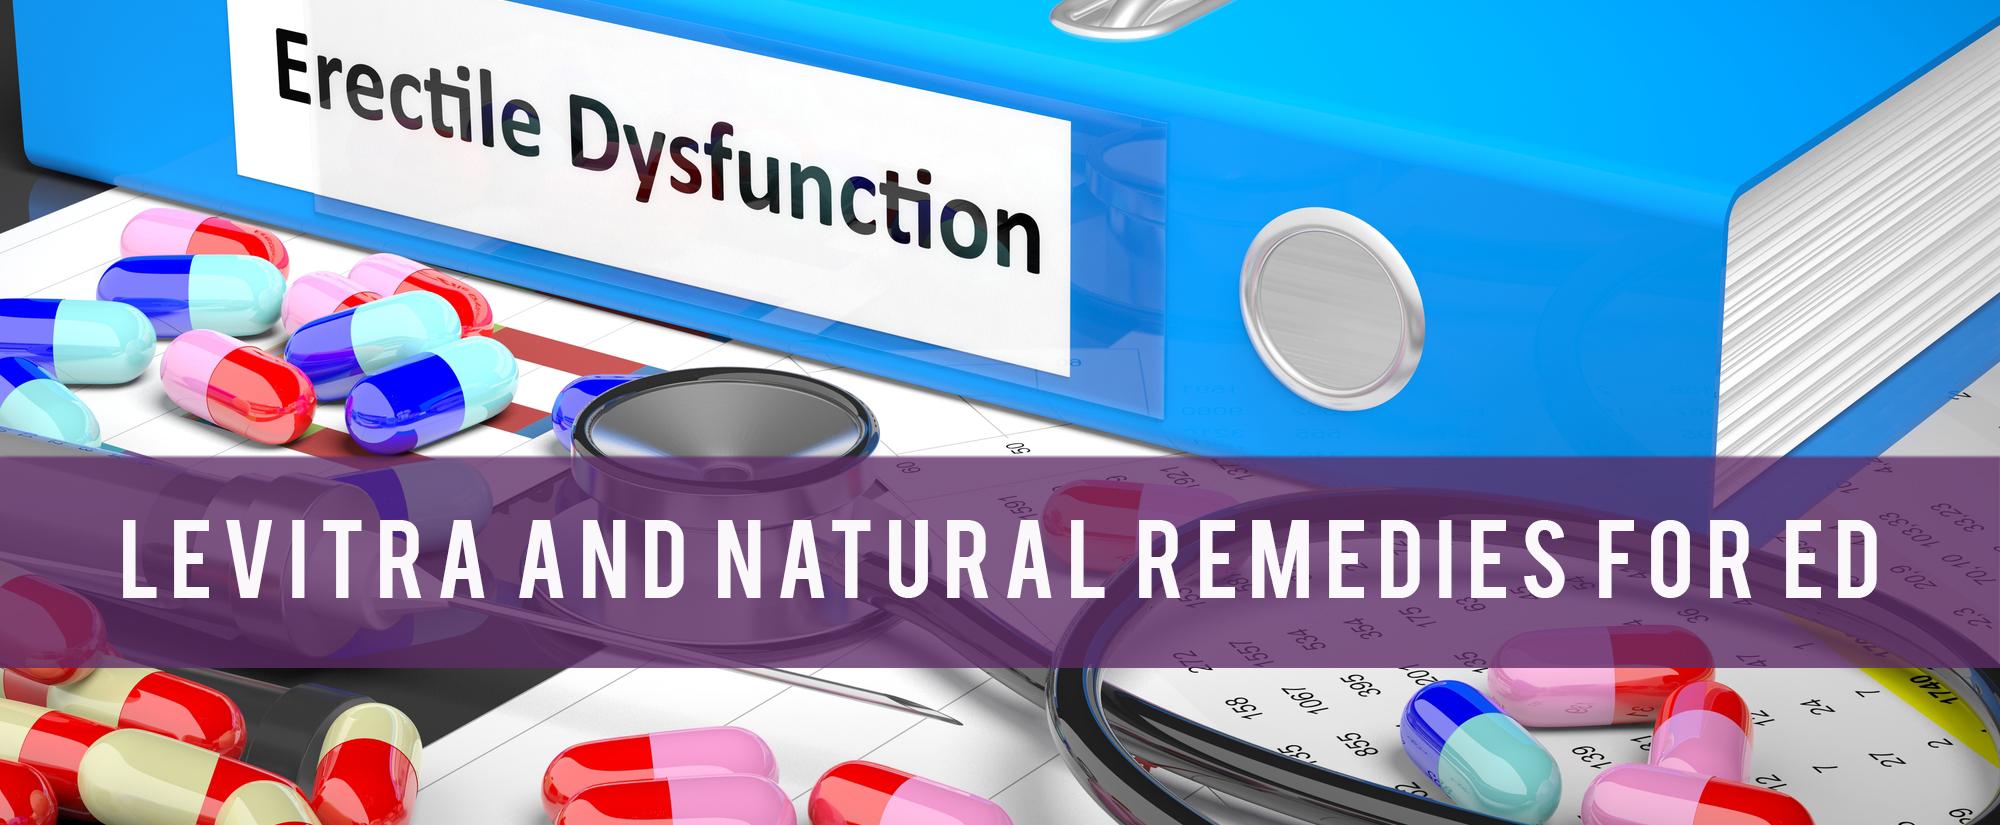 Levitra and natural remedies